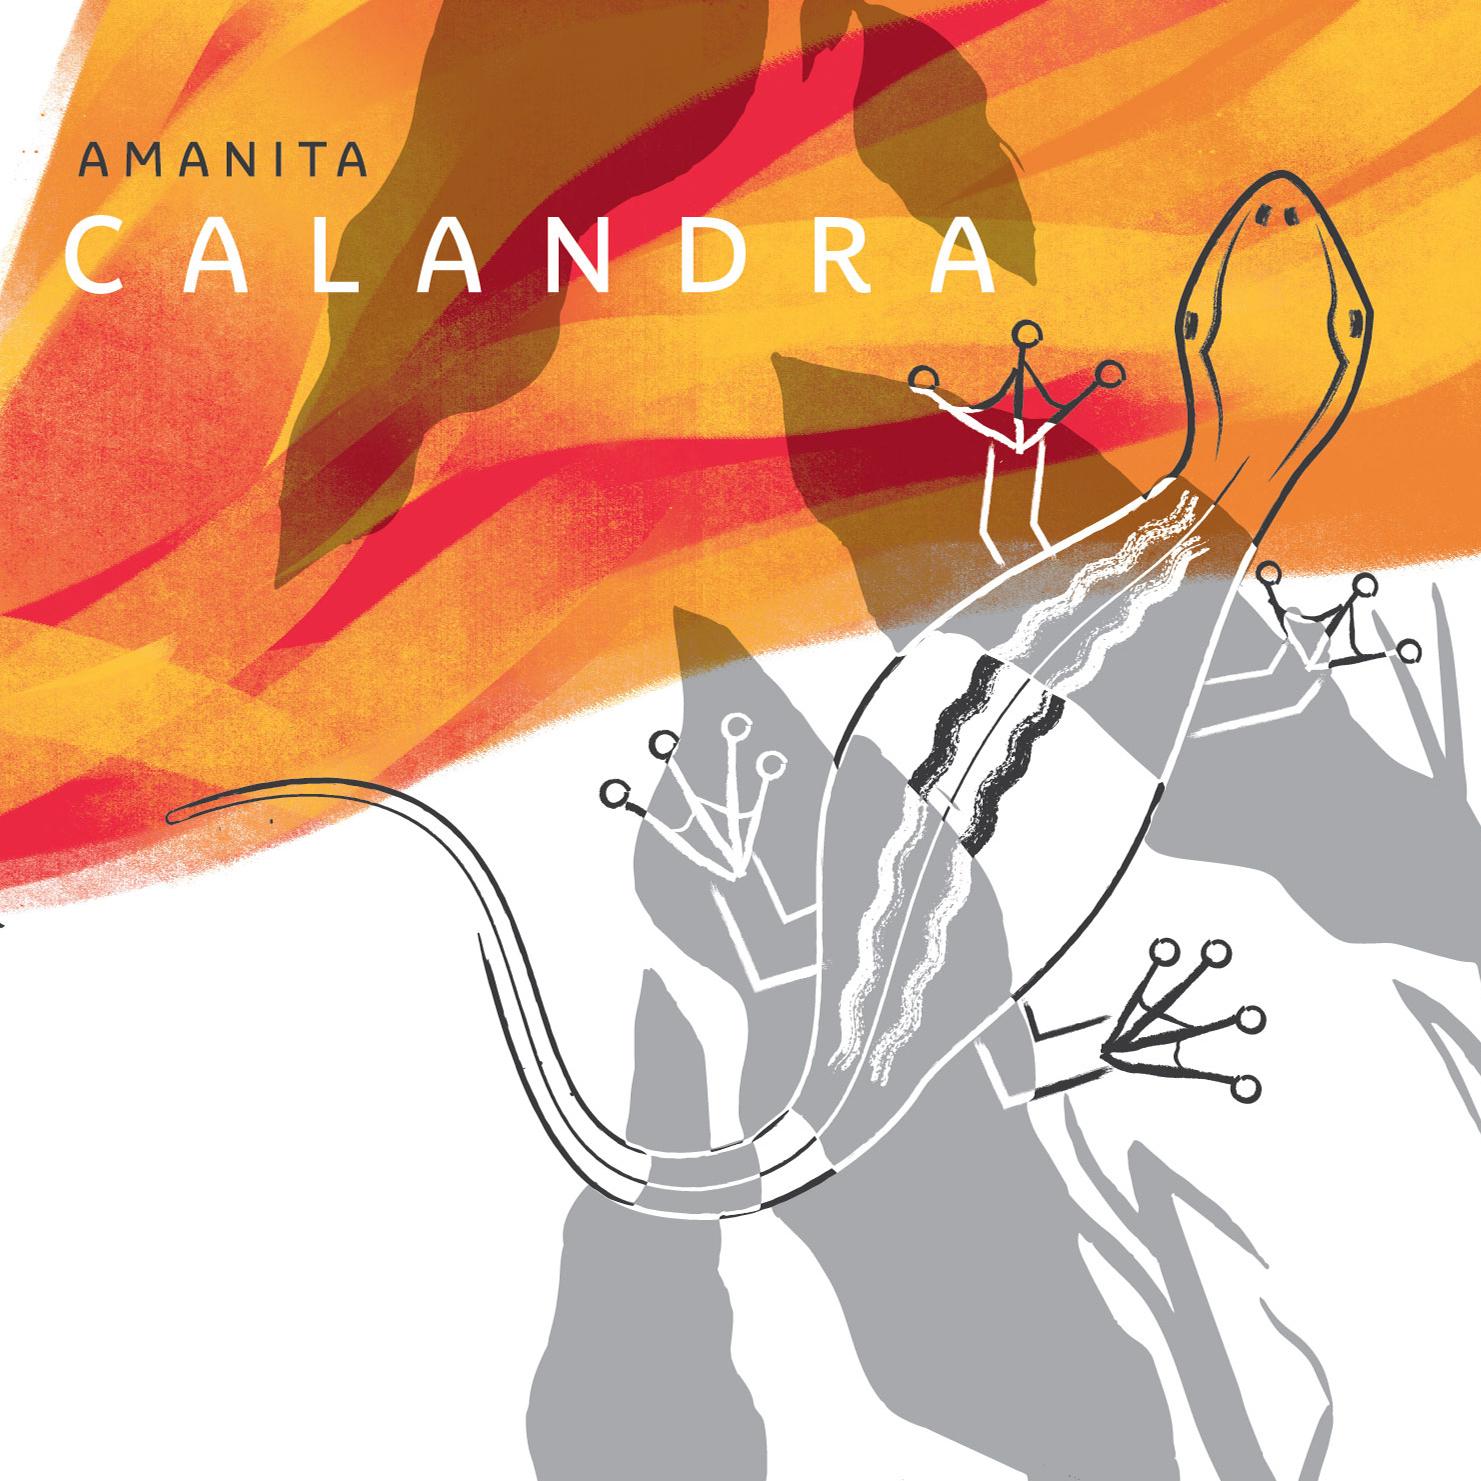 Calandra manitu records